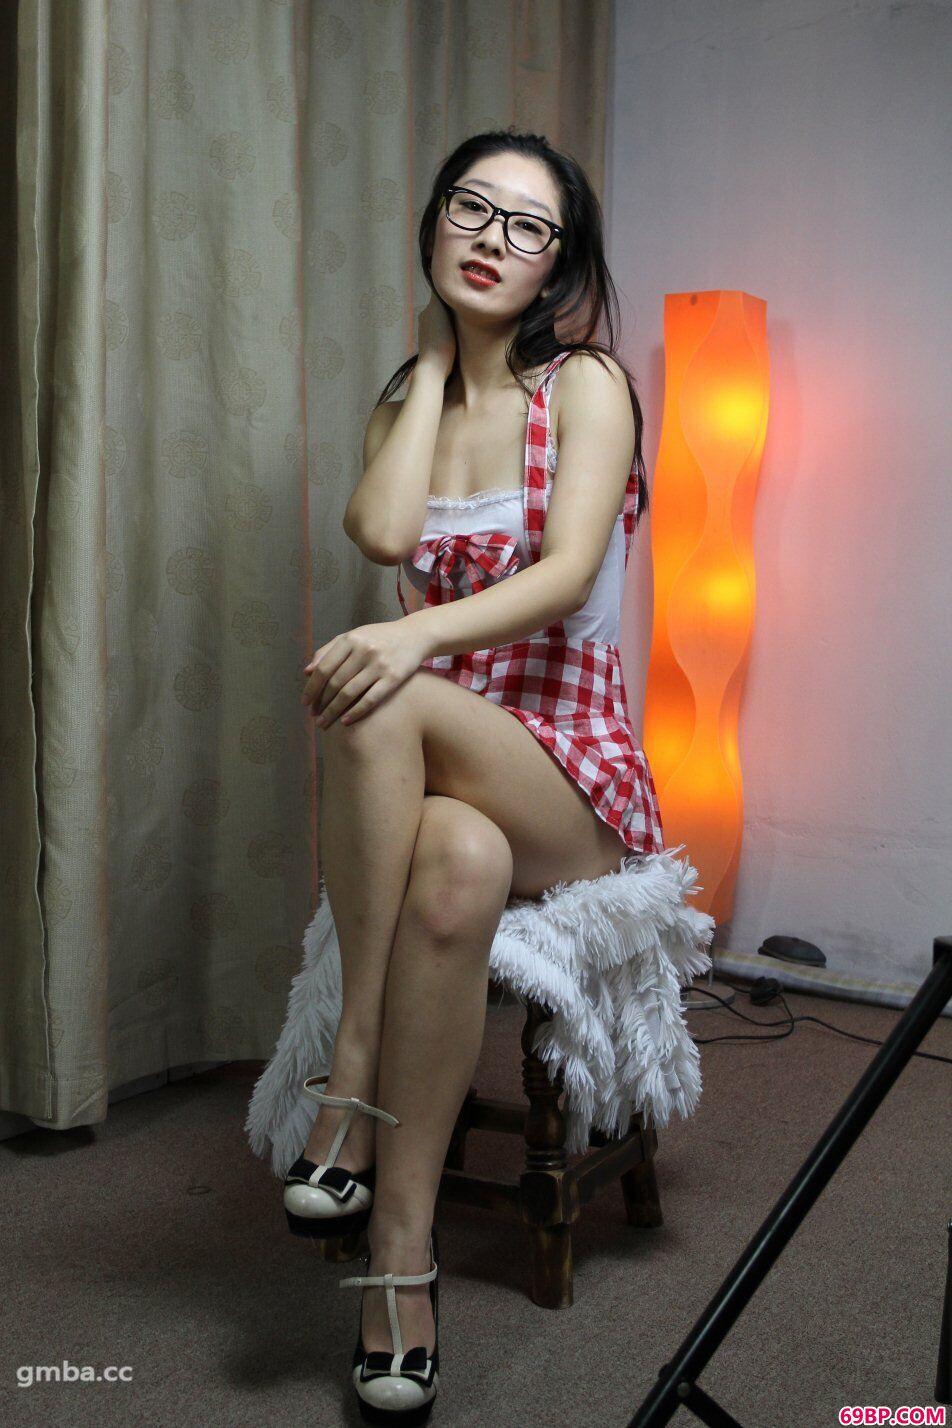 xixi模特小美(心茹)摘下墨镜大胆约拍顶级人体艺术_野外私拍30p